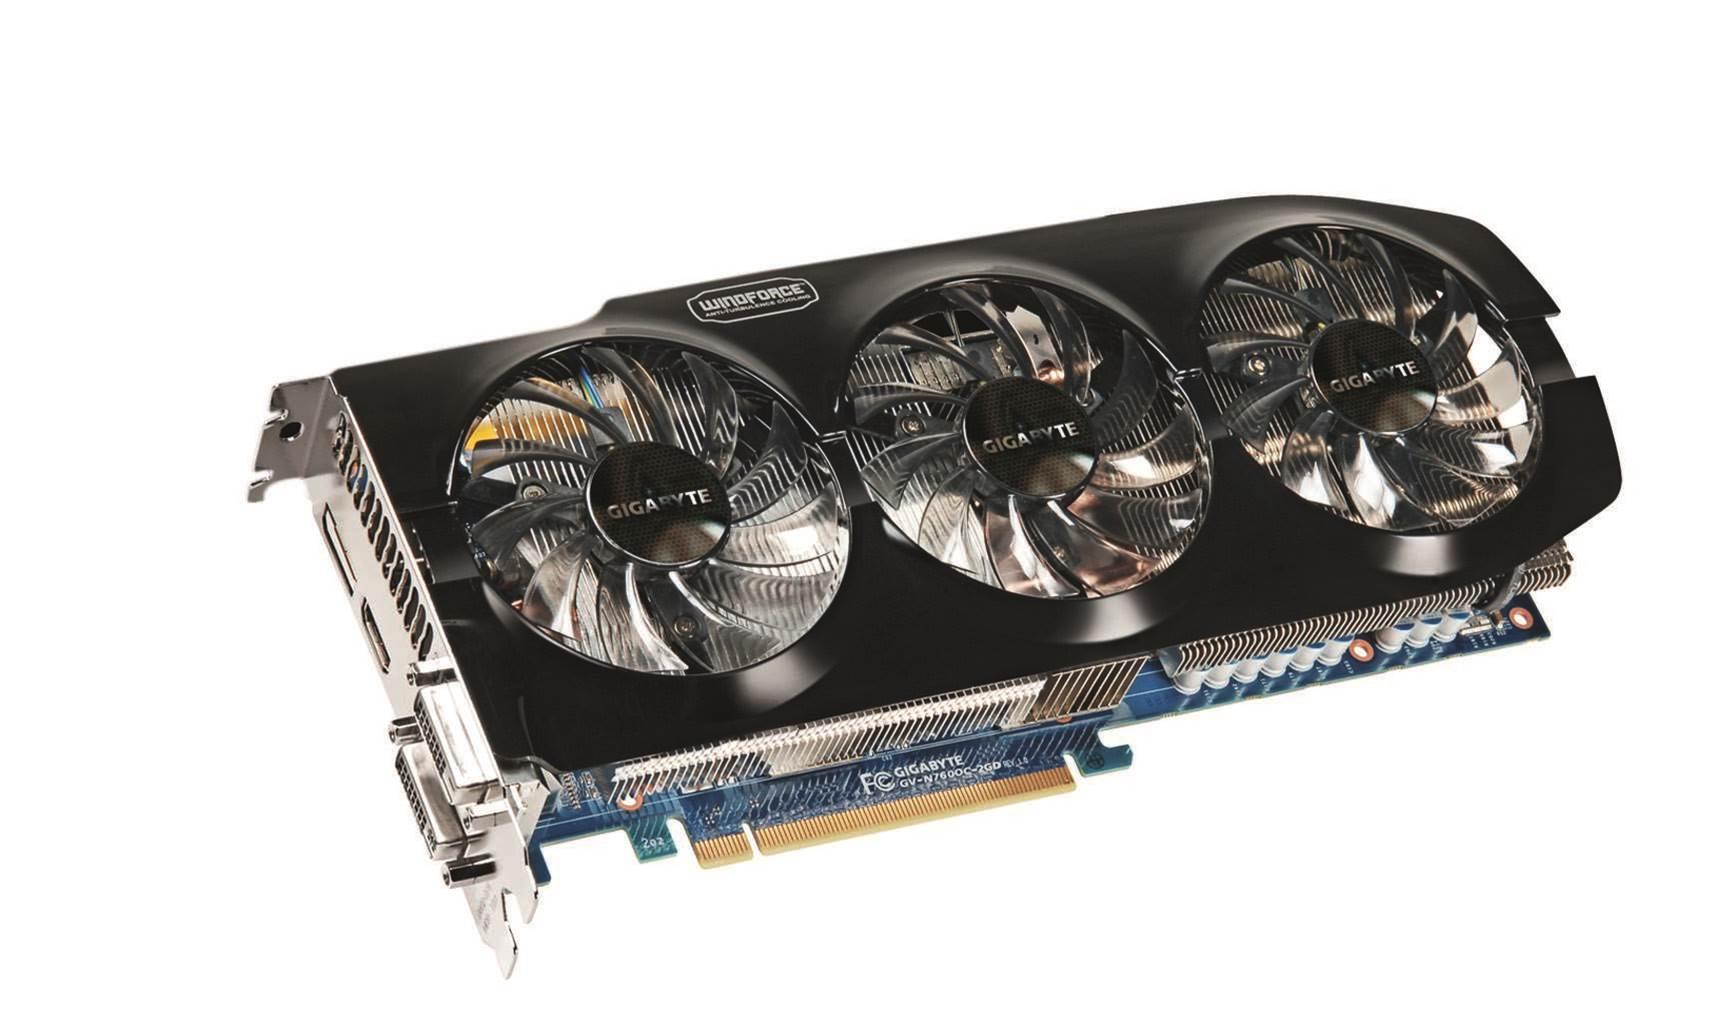 Review: Gigabyte GeForce GTX 760 OC Edition